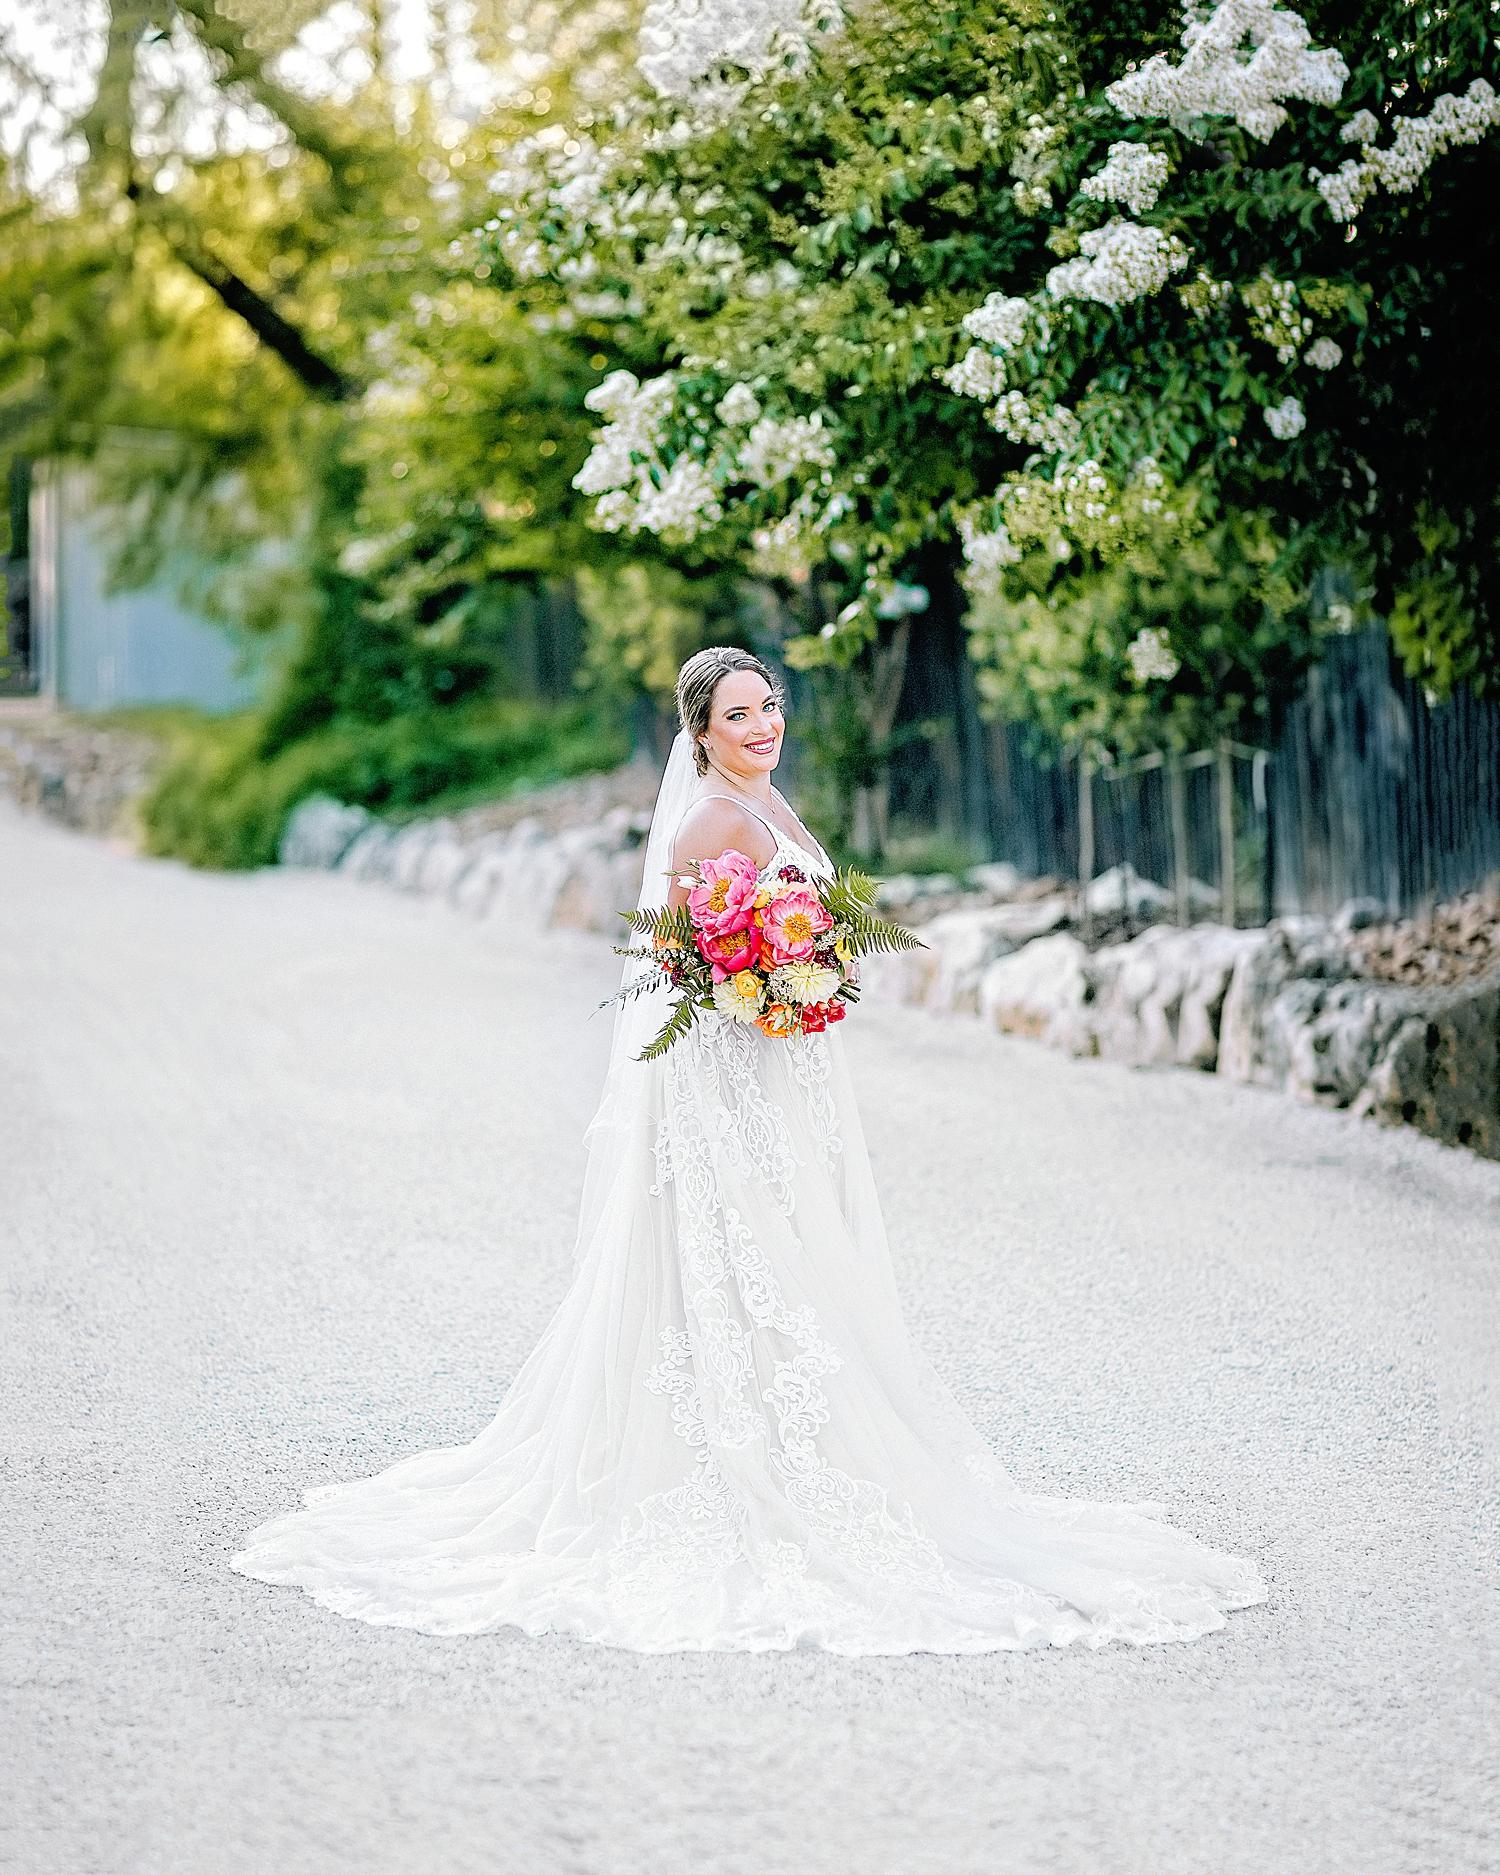 Gruene-Estate-Wedding-New-Braunfels-Bride-Bridal-Photos-Carly-Barton-Photography_0030.jpg